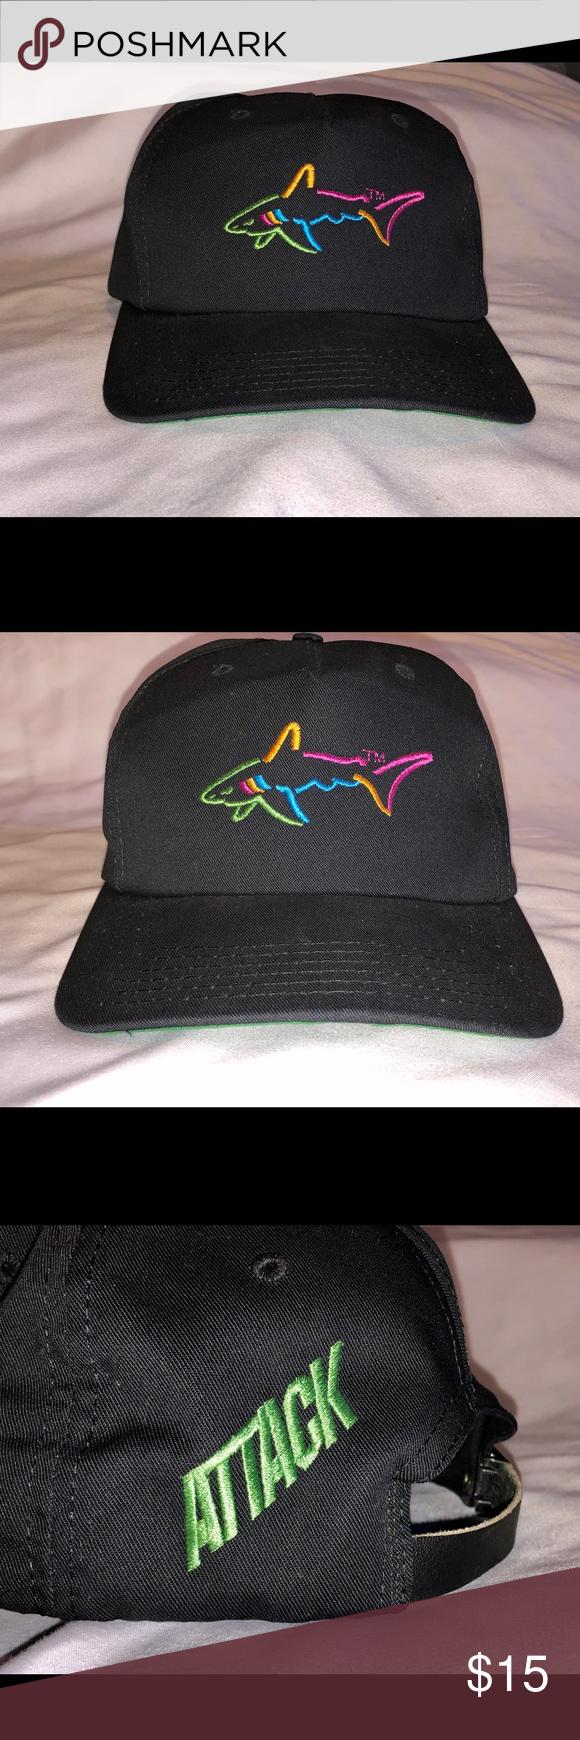 Vintage Greg Norman Neon Shark Adjustable Hat Adjustable Hat Leather Straps Greg Norman